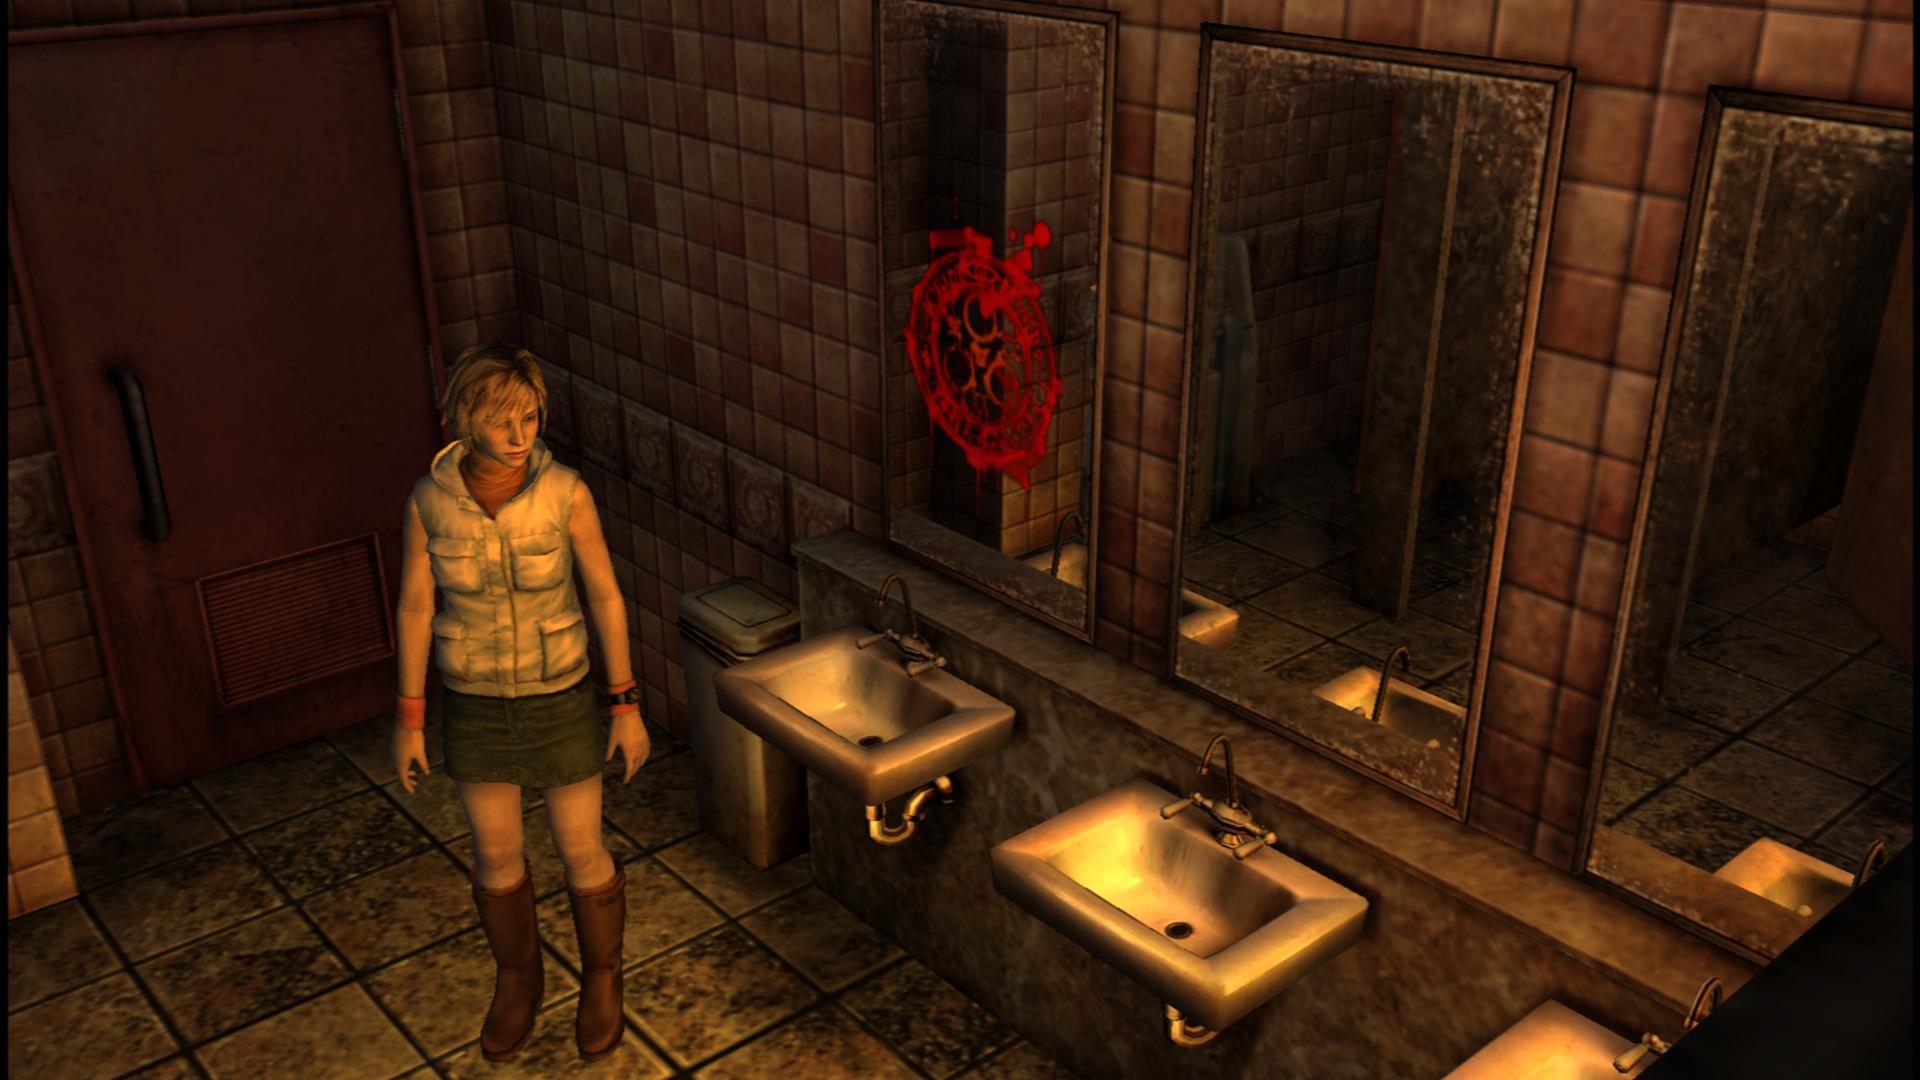 Silent Hill 3 pCSx2 2426537-7925255206-SH3_P